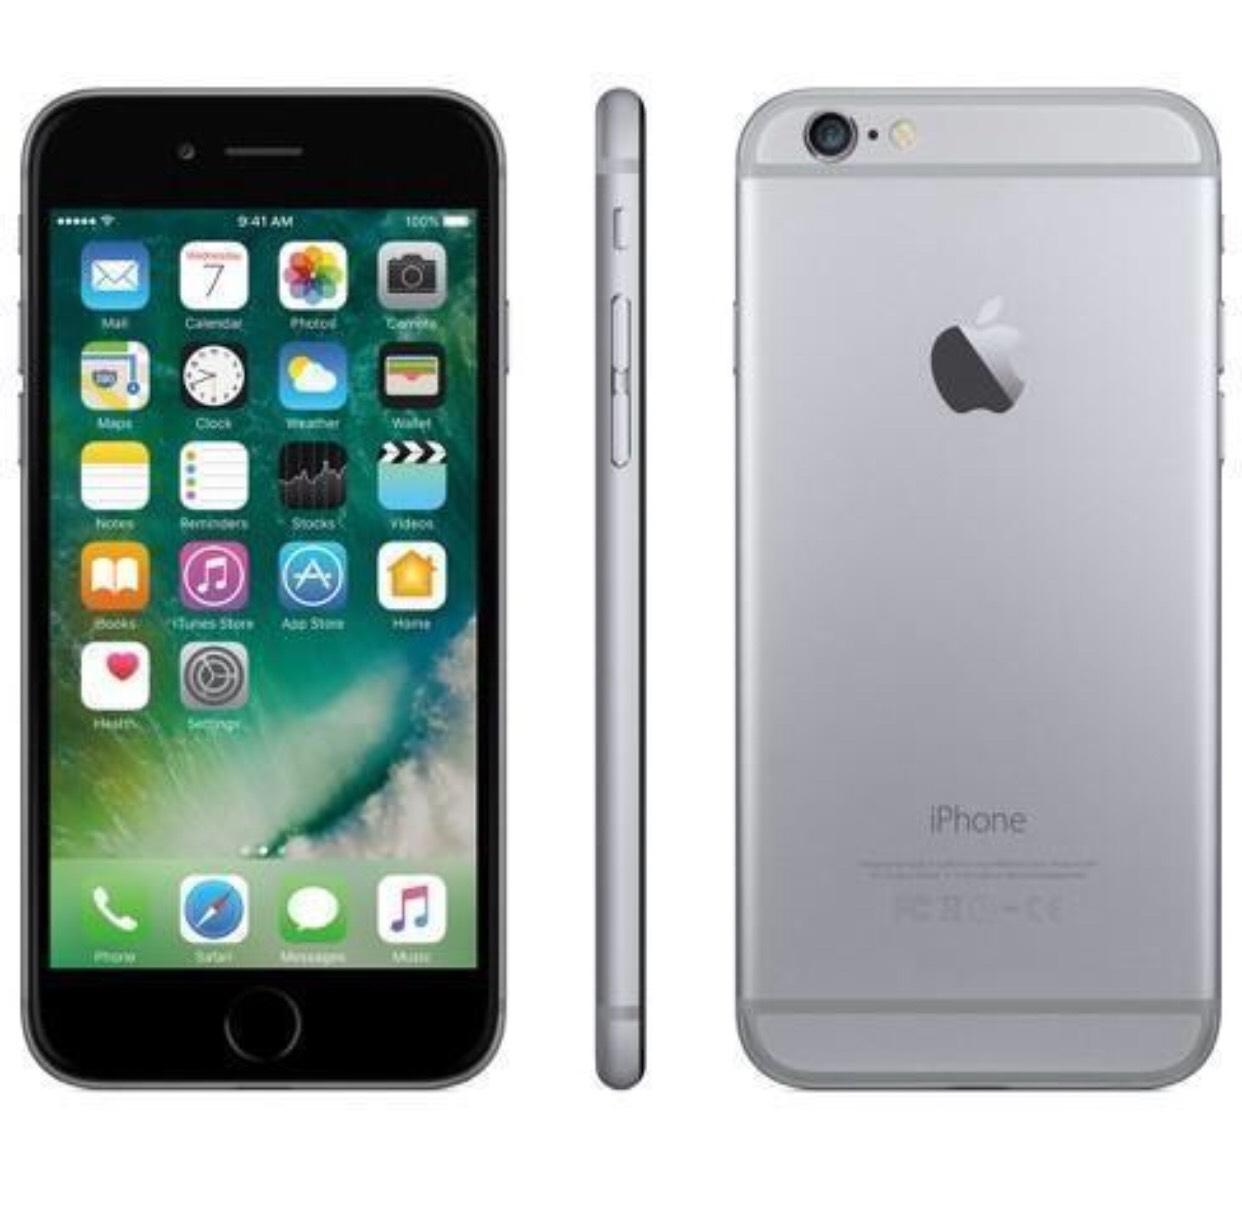 Grade B Apple iphone 6 16gb space grey smartphone vodafone network £69.99 at itzoo